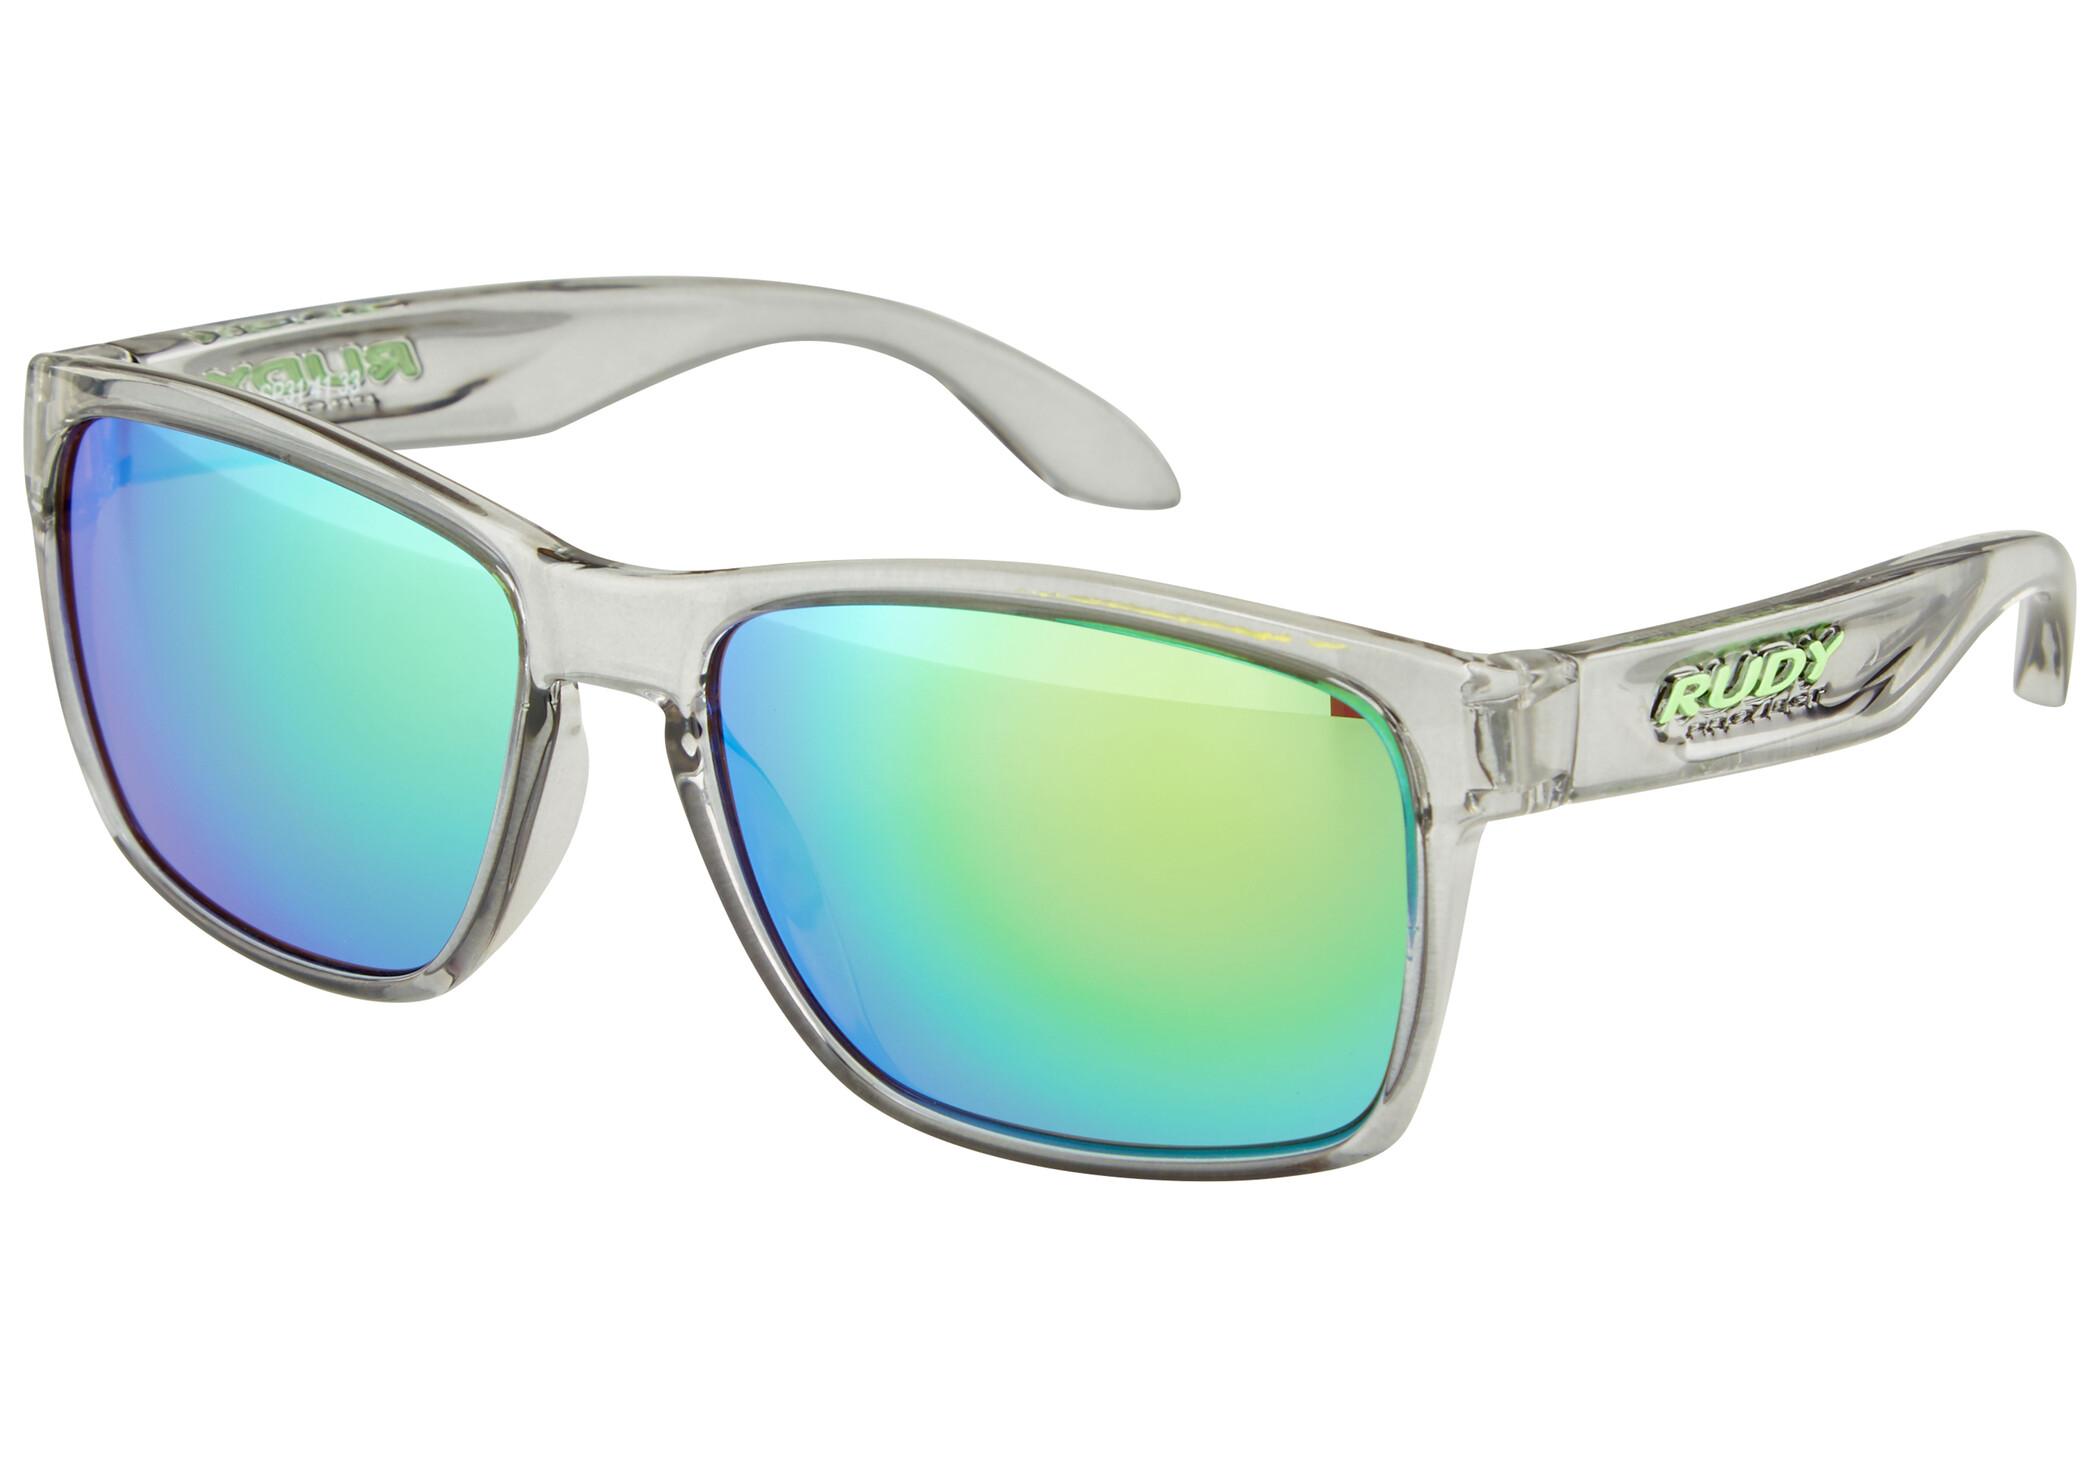 Rudy Project Spinhawk Cykelbriller, crystal ash - rp optics multilaser green | Briller